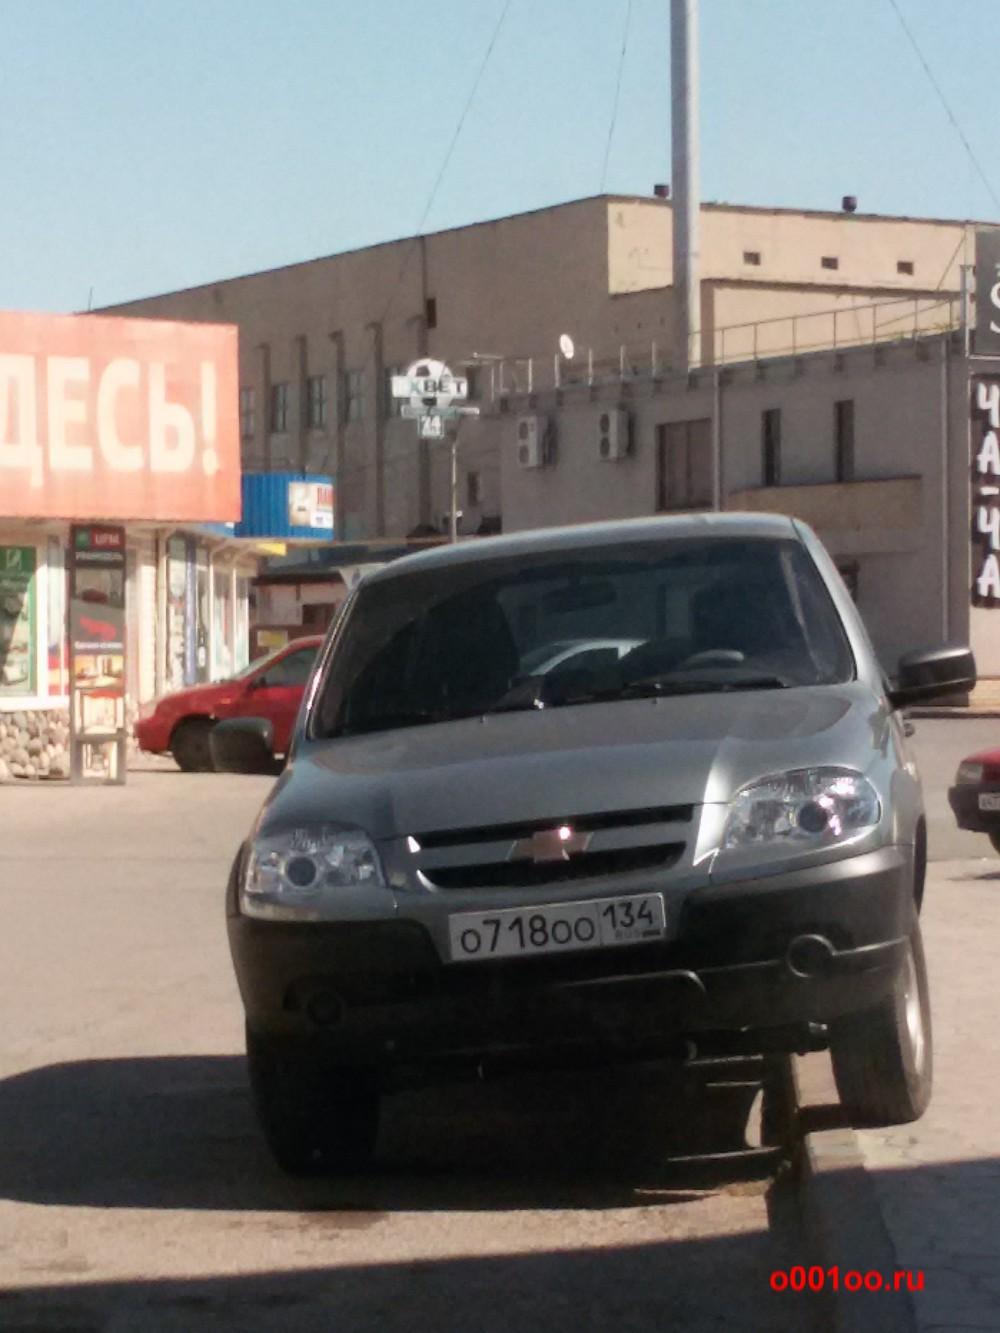 о718оо134